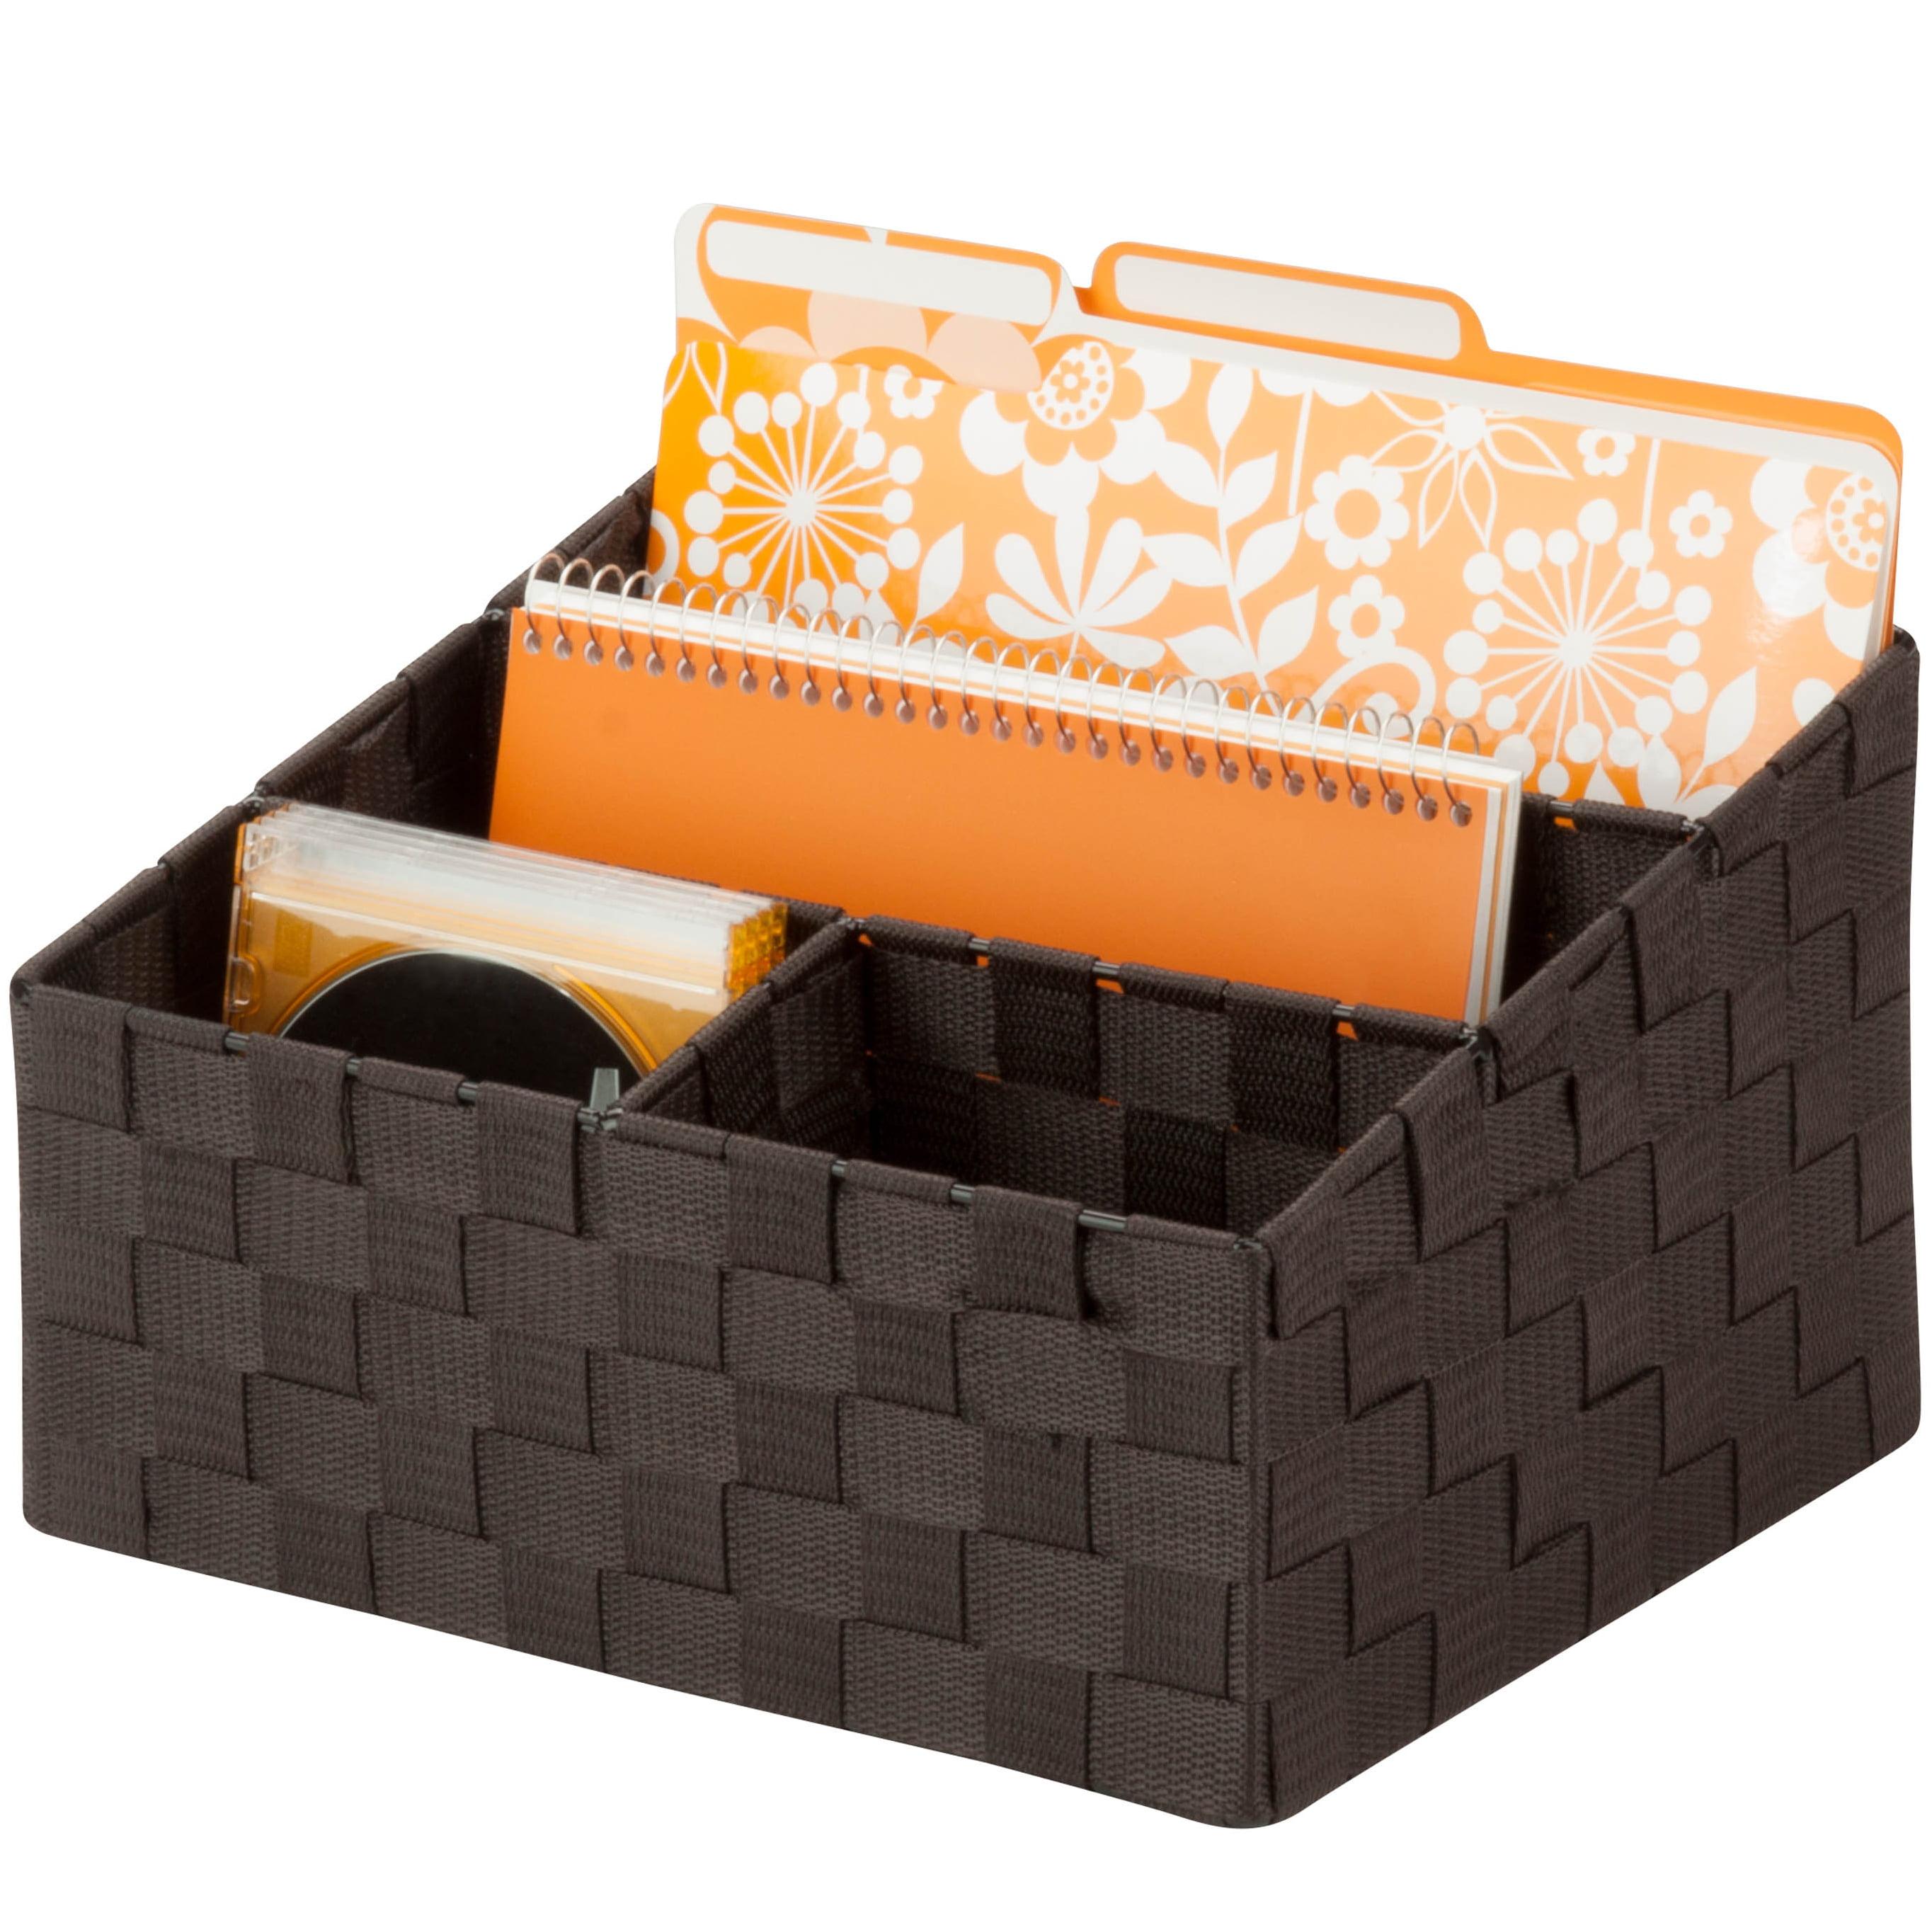 Honey Can Do Woven Mail and File Desk Organizer, Espresso